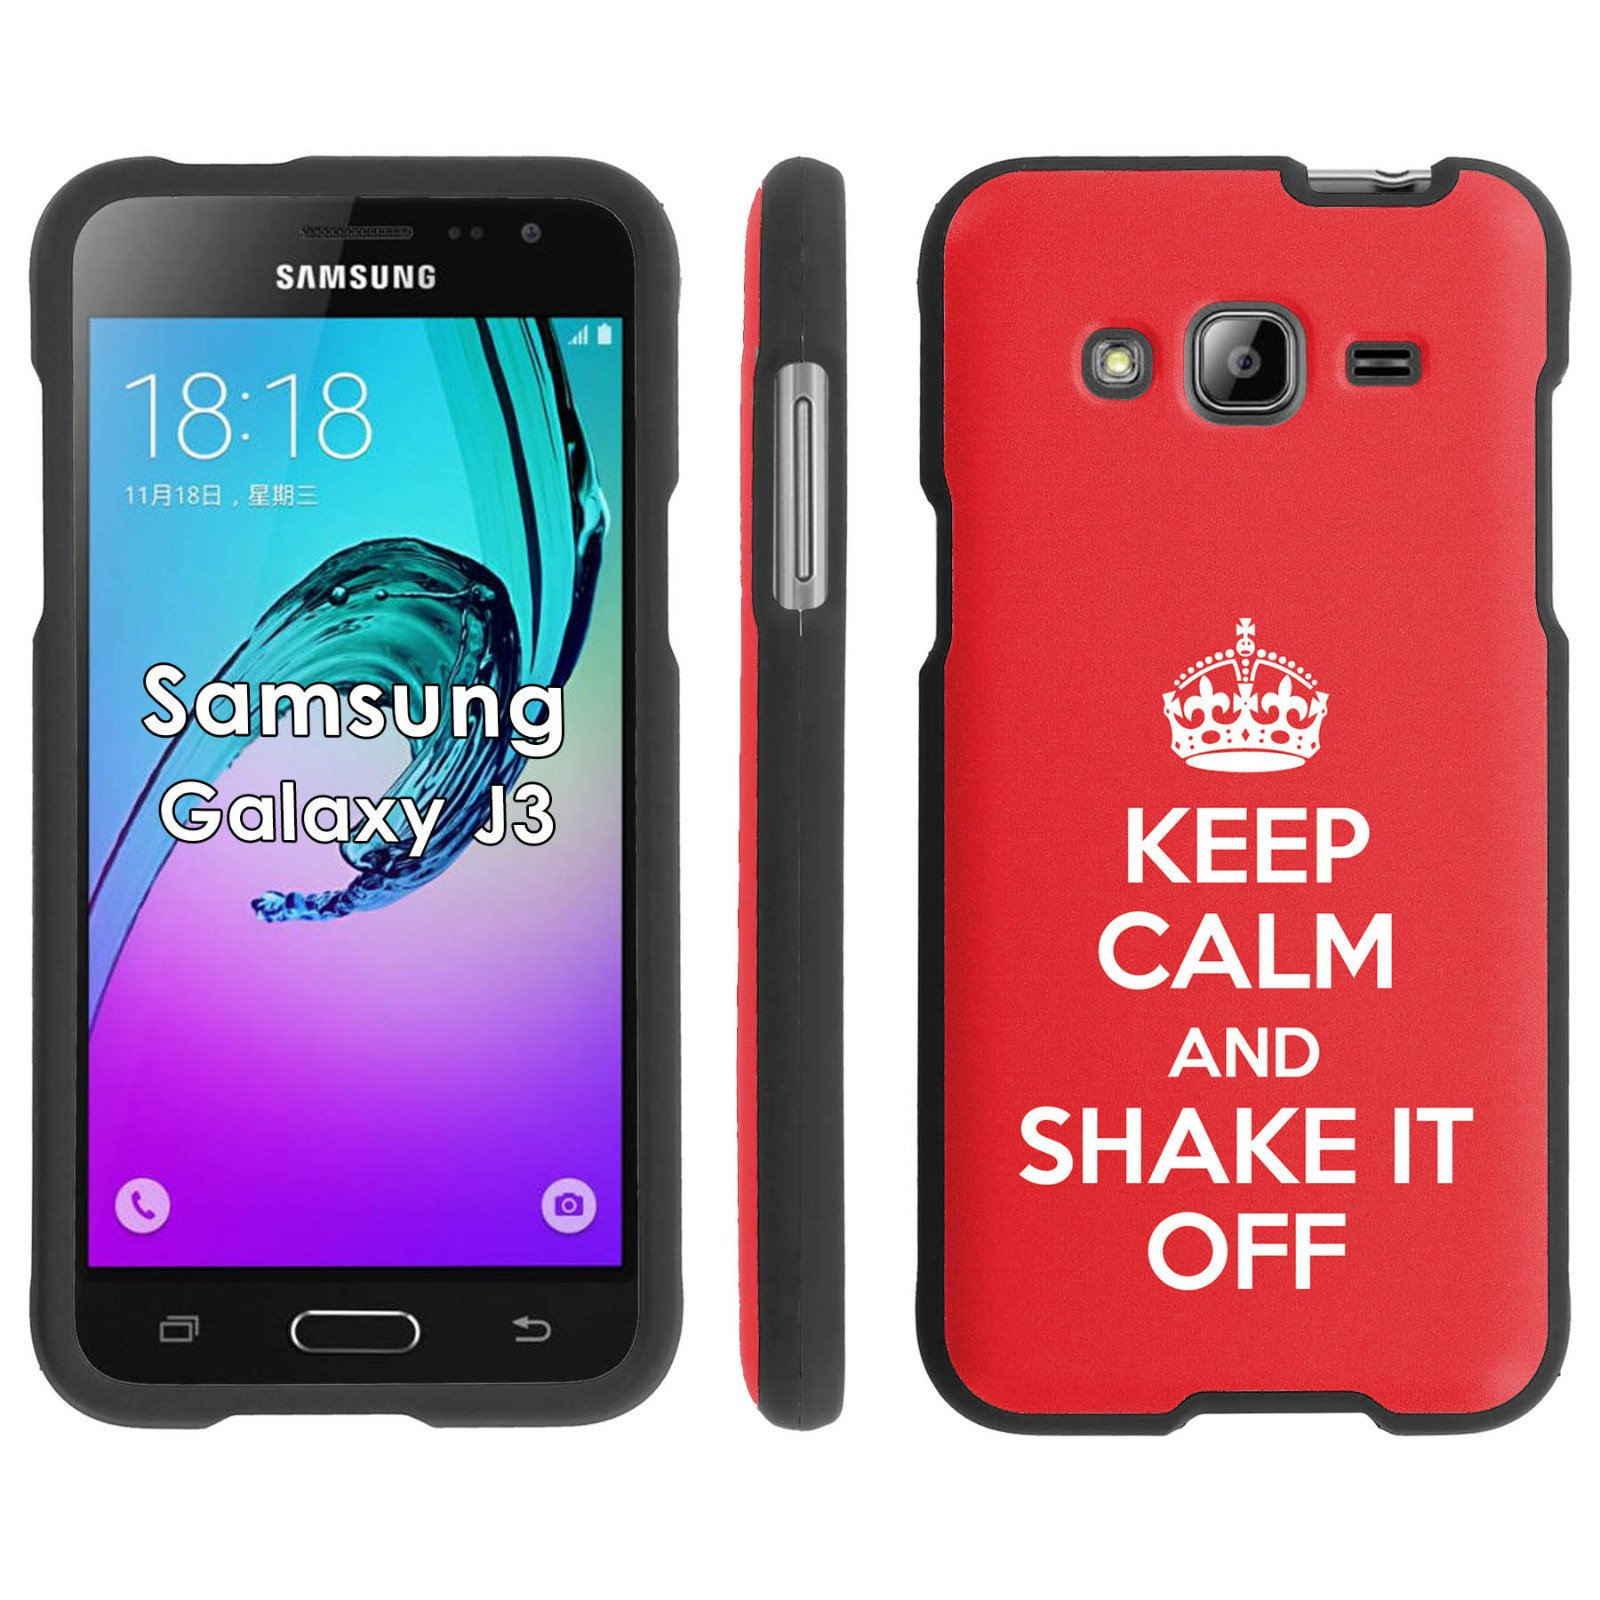 Samsung Galaxy J3 Phone Cover, Keep Calm and Shake it Off - BLACK ...